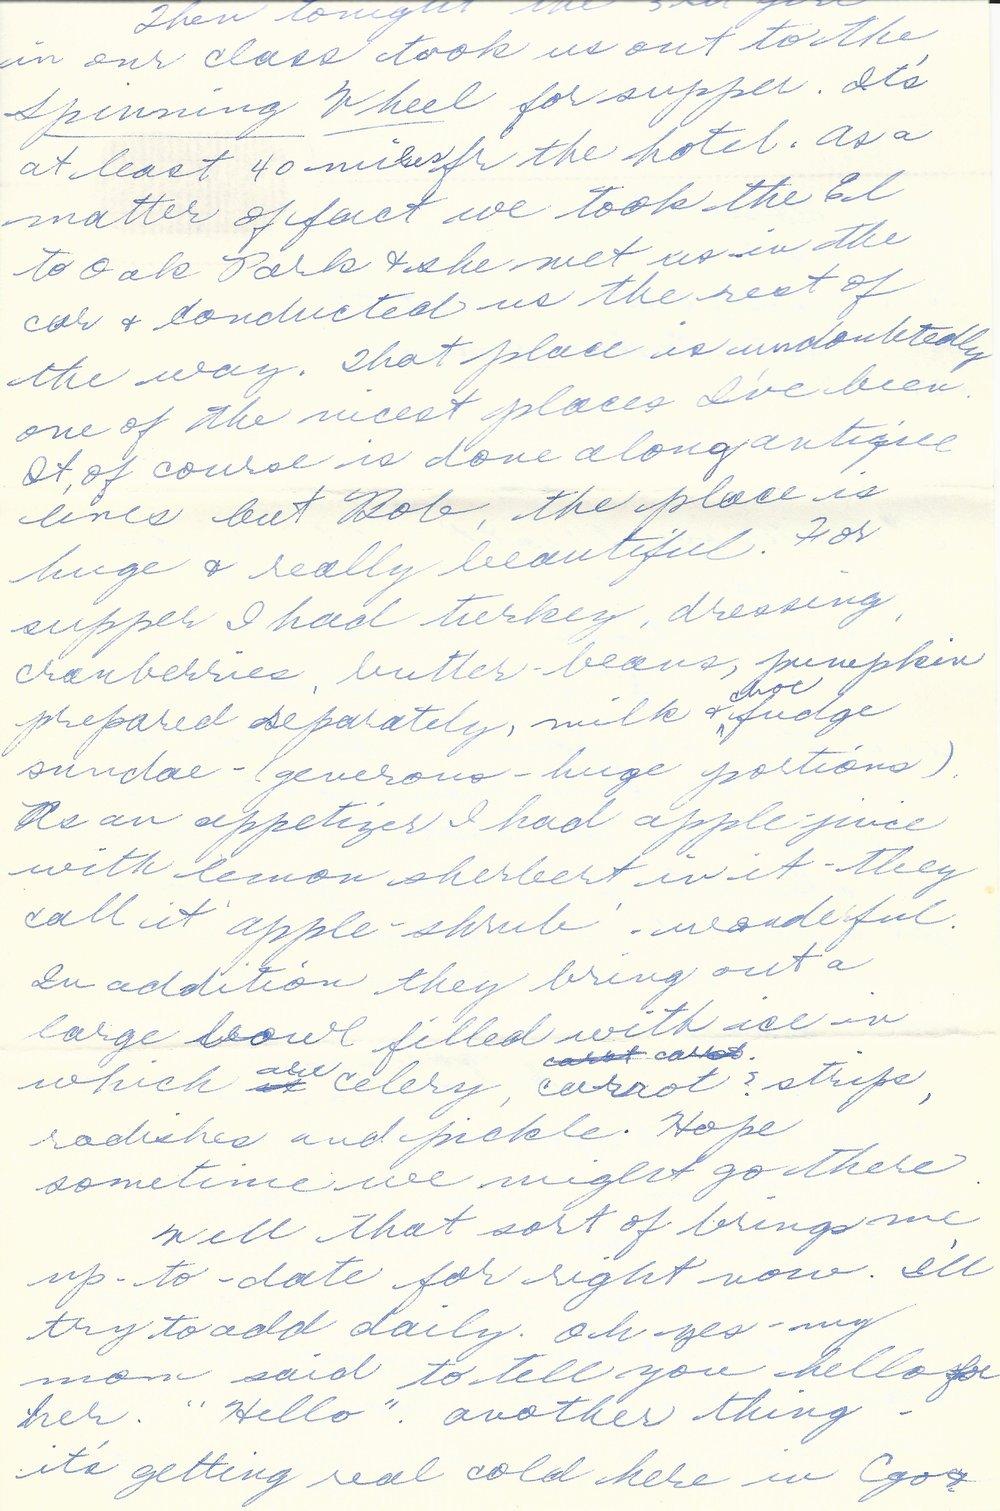 7. Oct. 9-21, 1952 (Oma)_Page_11.jpg